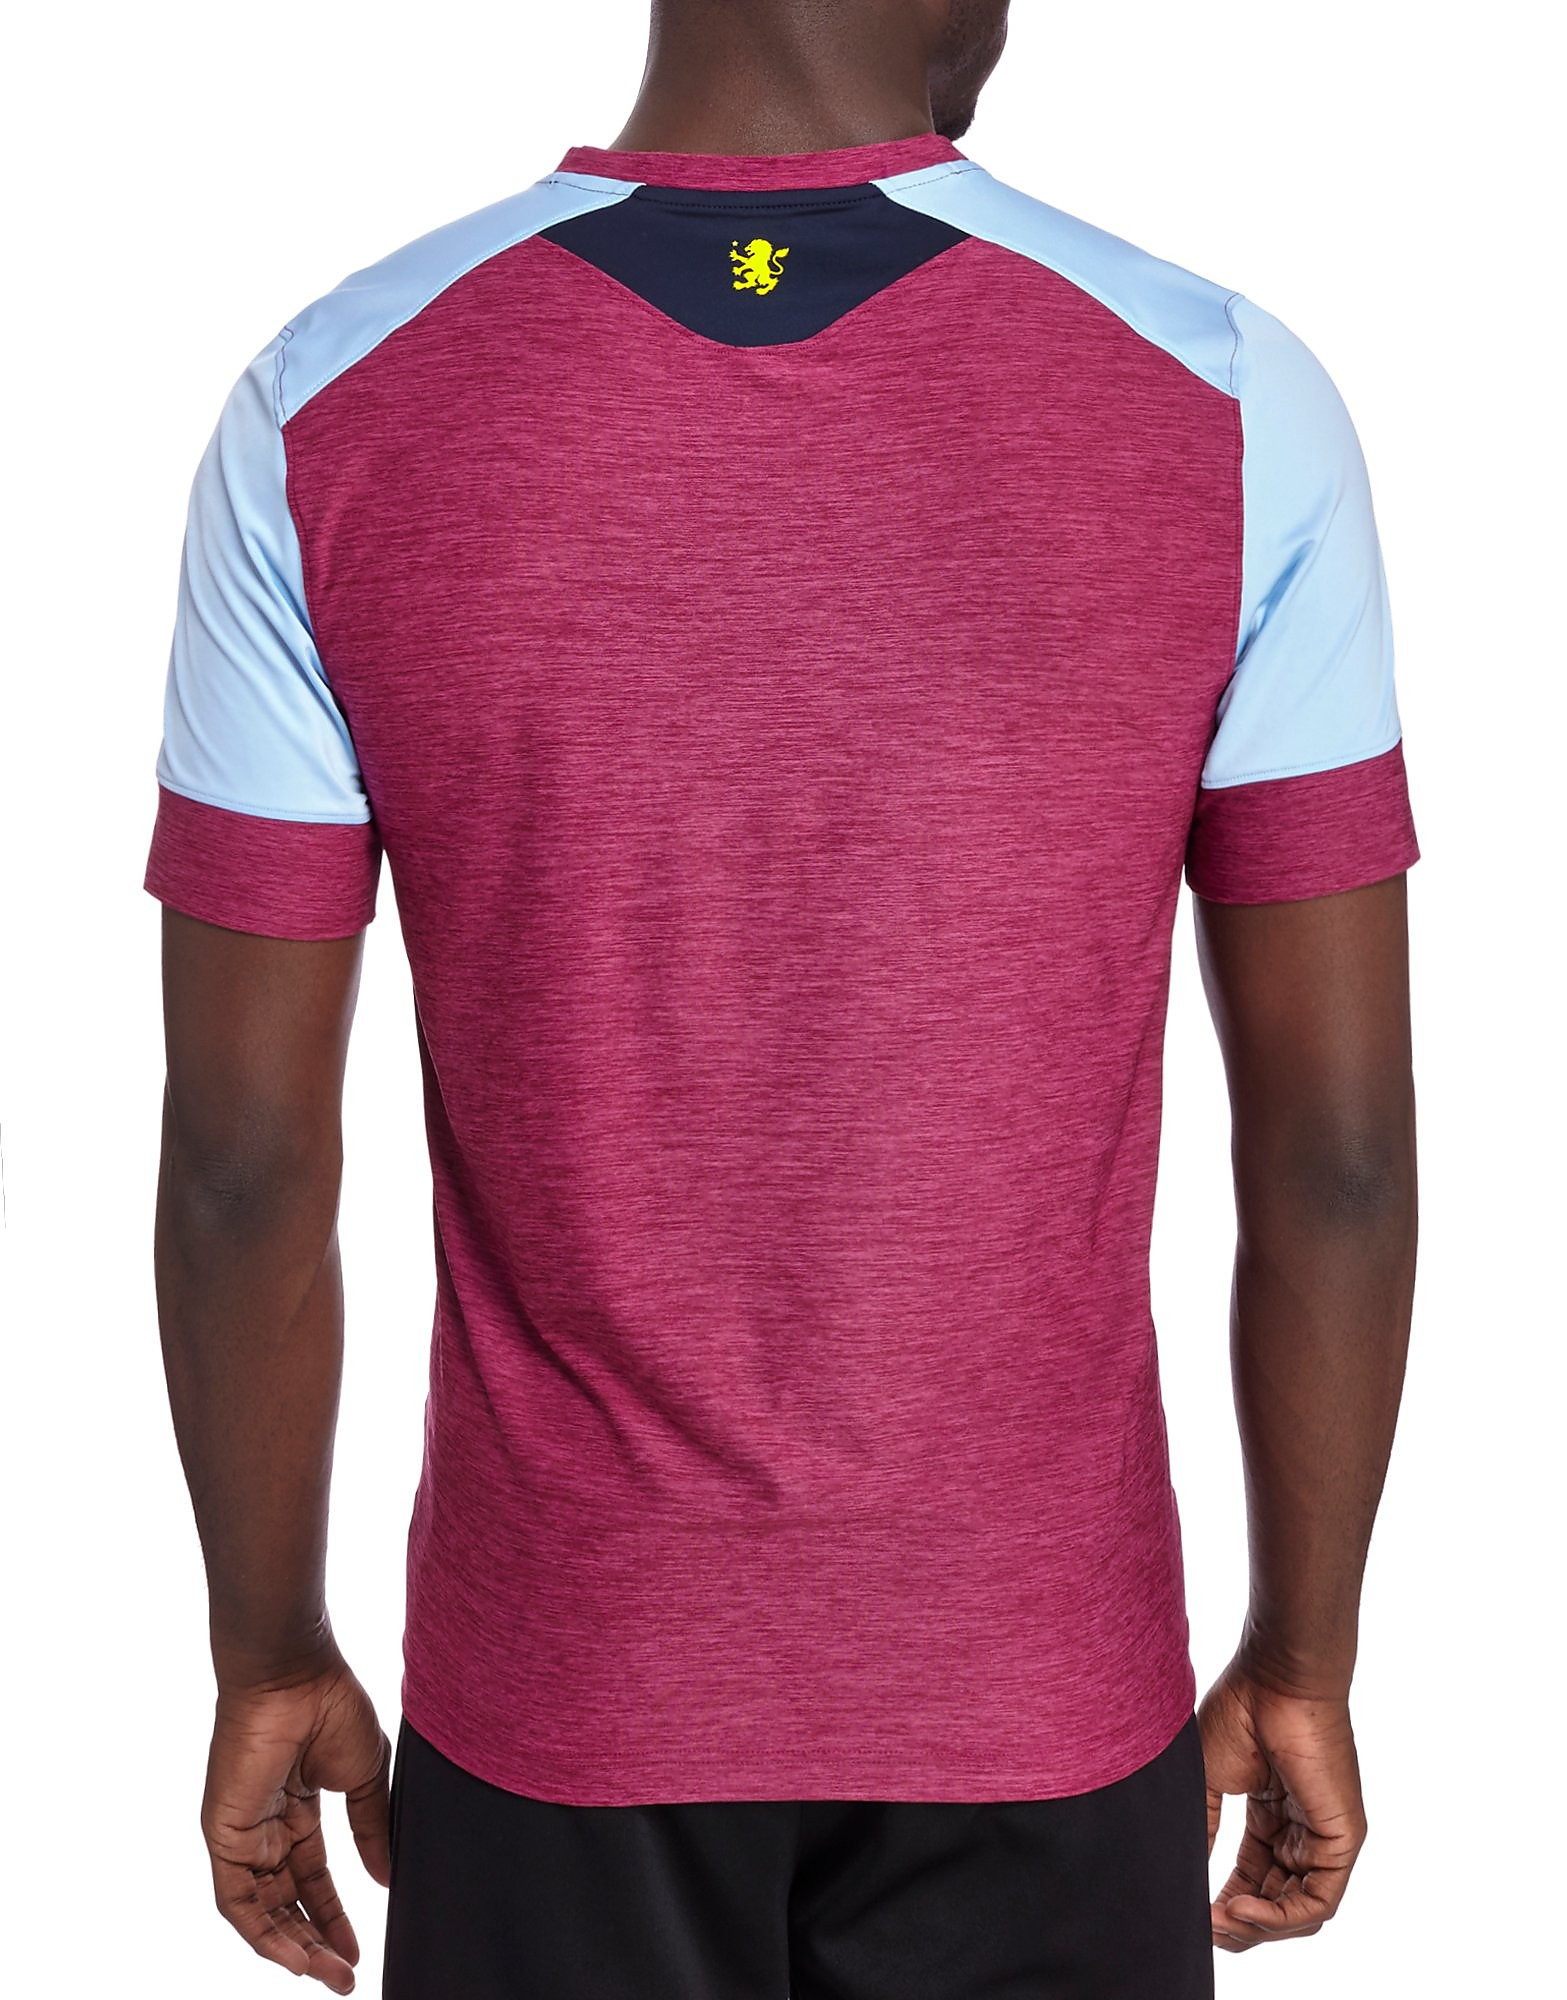 Under Armour Aston Villa 2016/17 Training Shirt